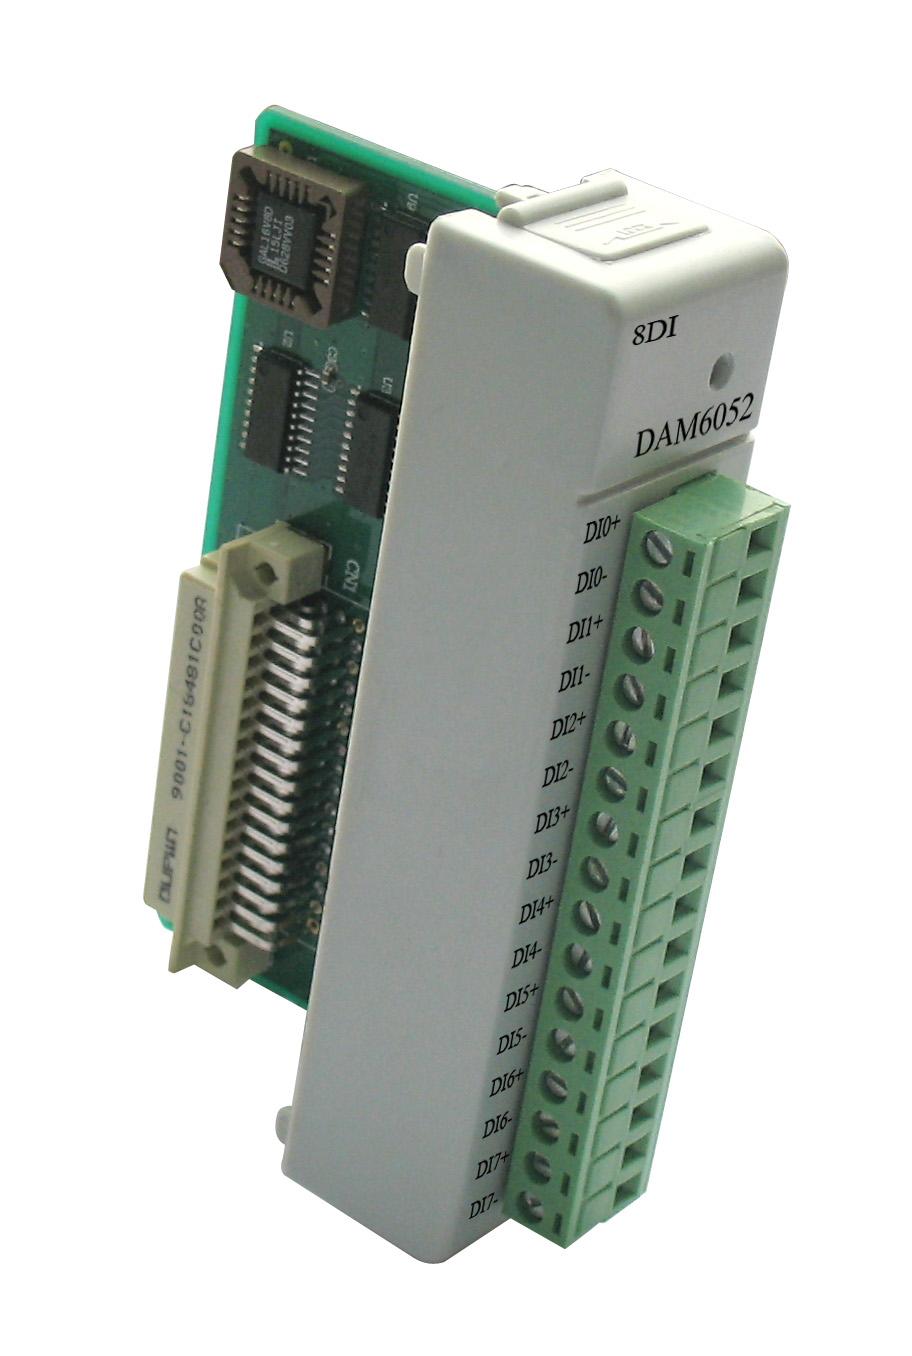 ART-阿尔泰科技DAM6052-8路隔离数字量输入模块